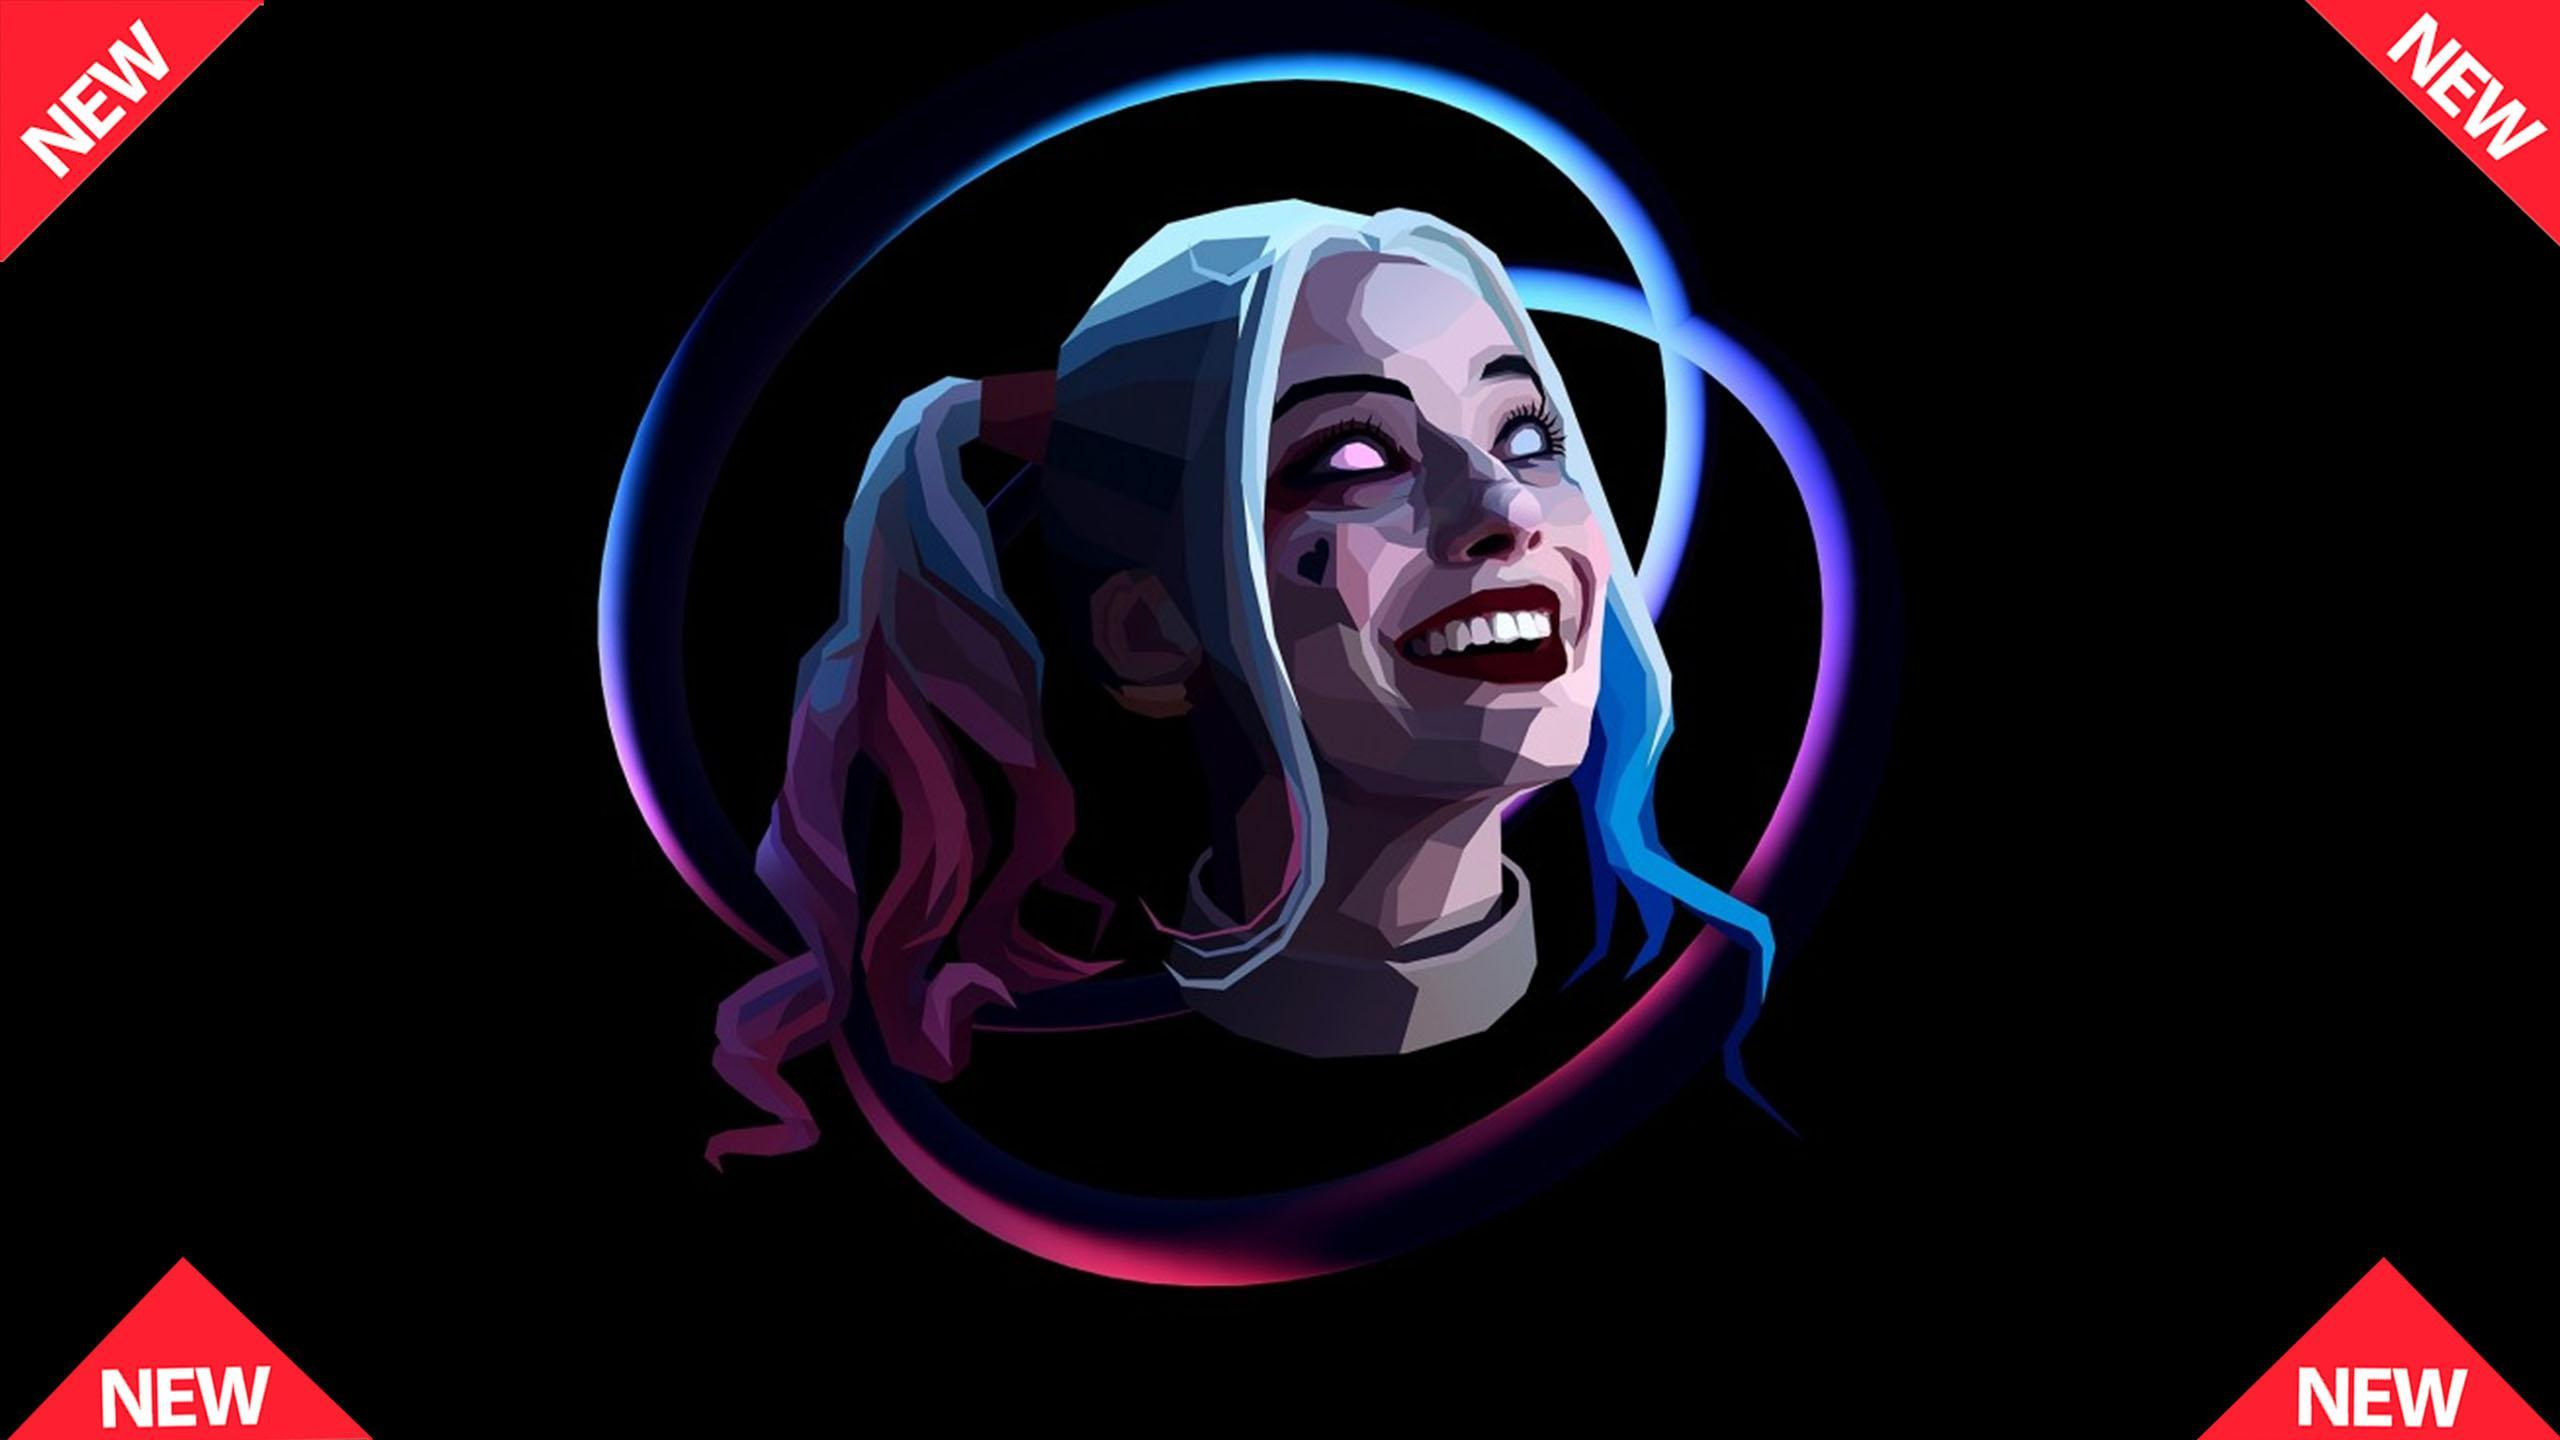 Joker And Harley Quinn Hd Wallpaper